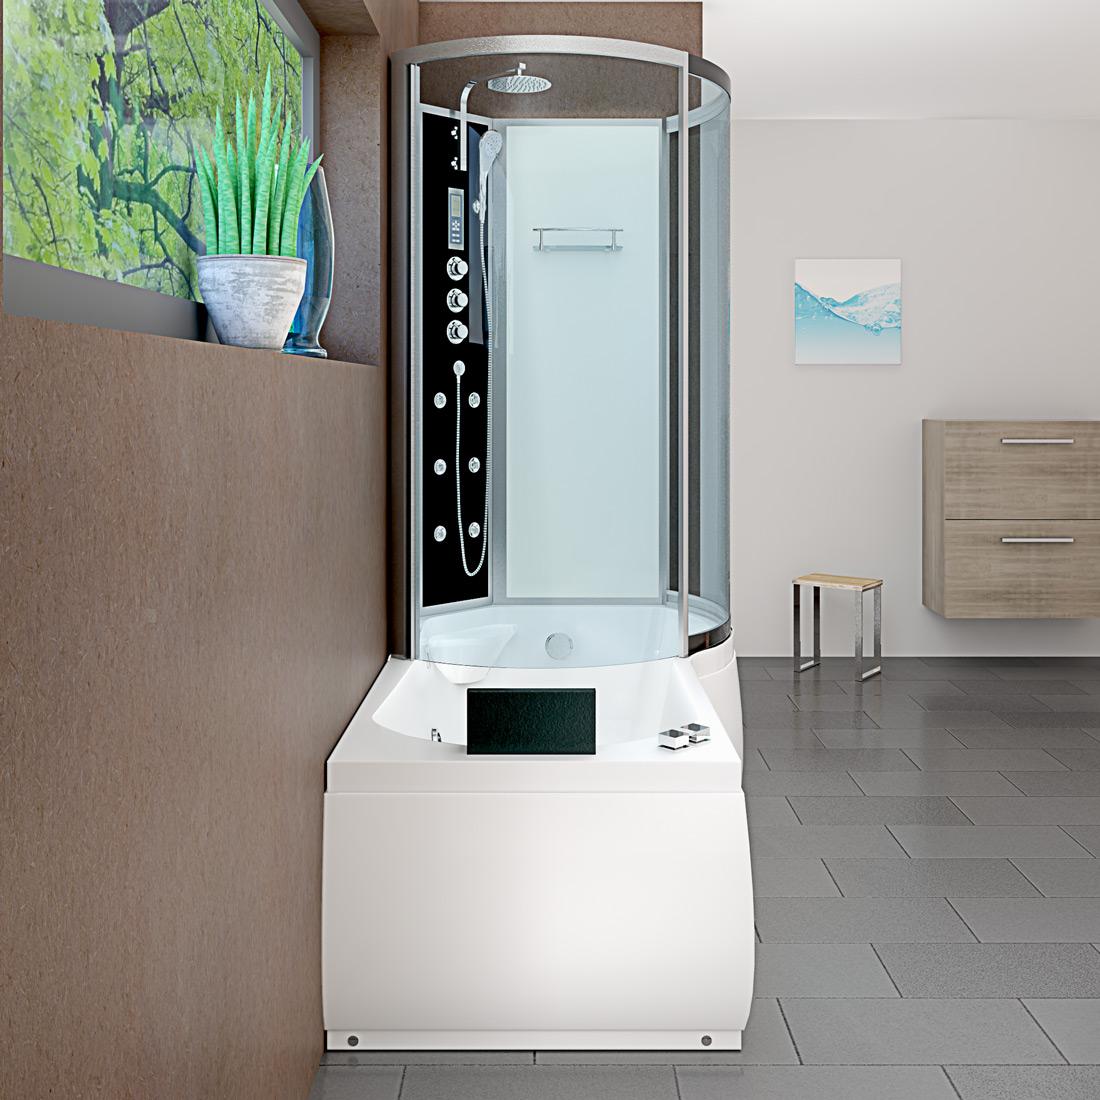 acquavapore dtp8050 a007l dusch wannen kombi in 170x98cm trendbad24. Black Bedroom Furniture Sets. Home Design Ideas